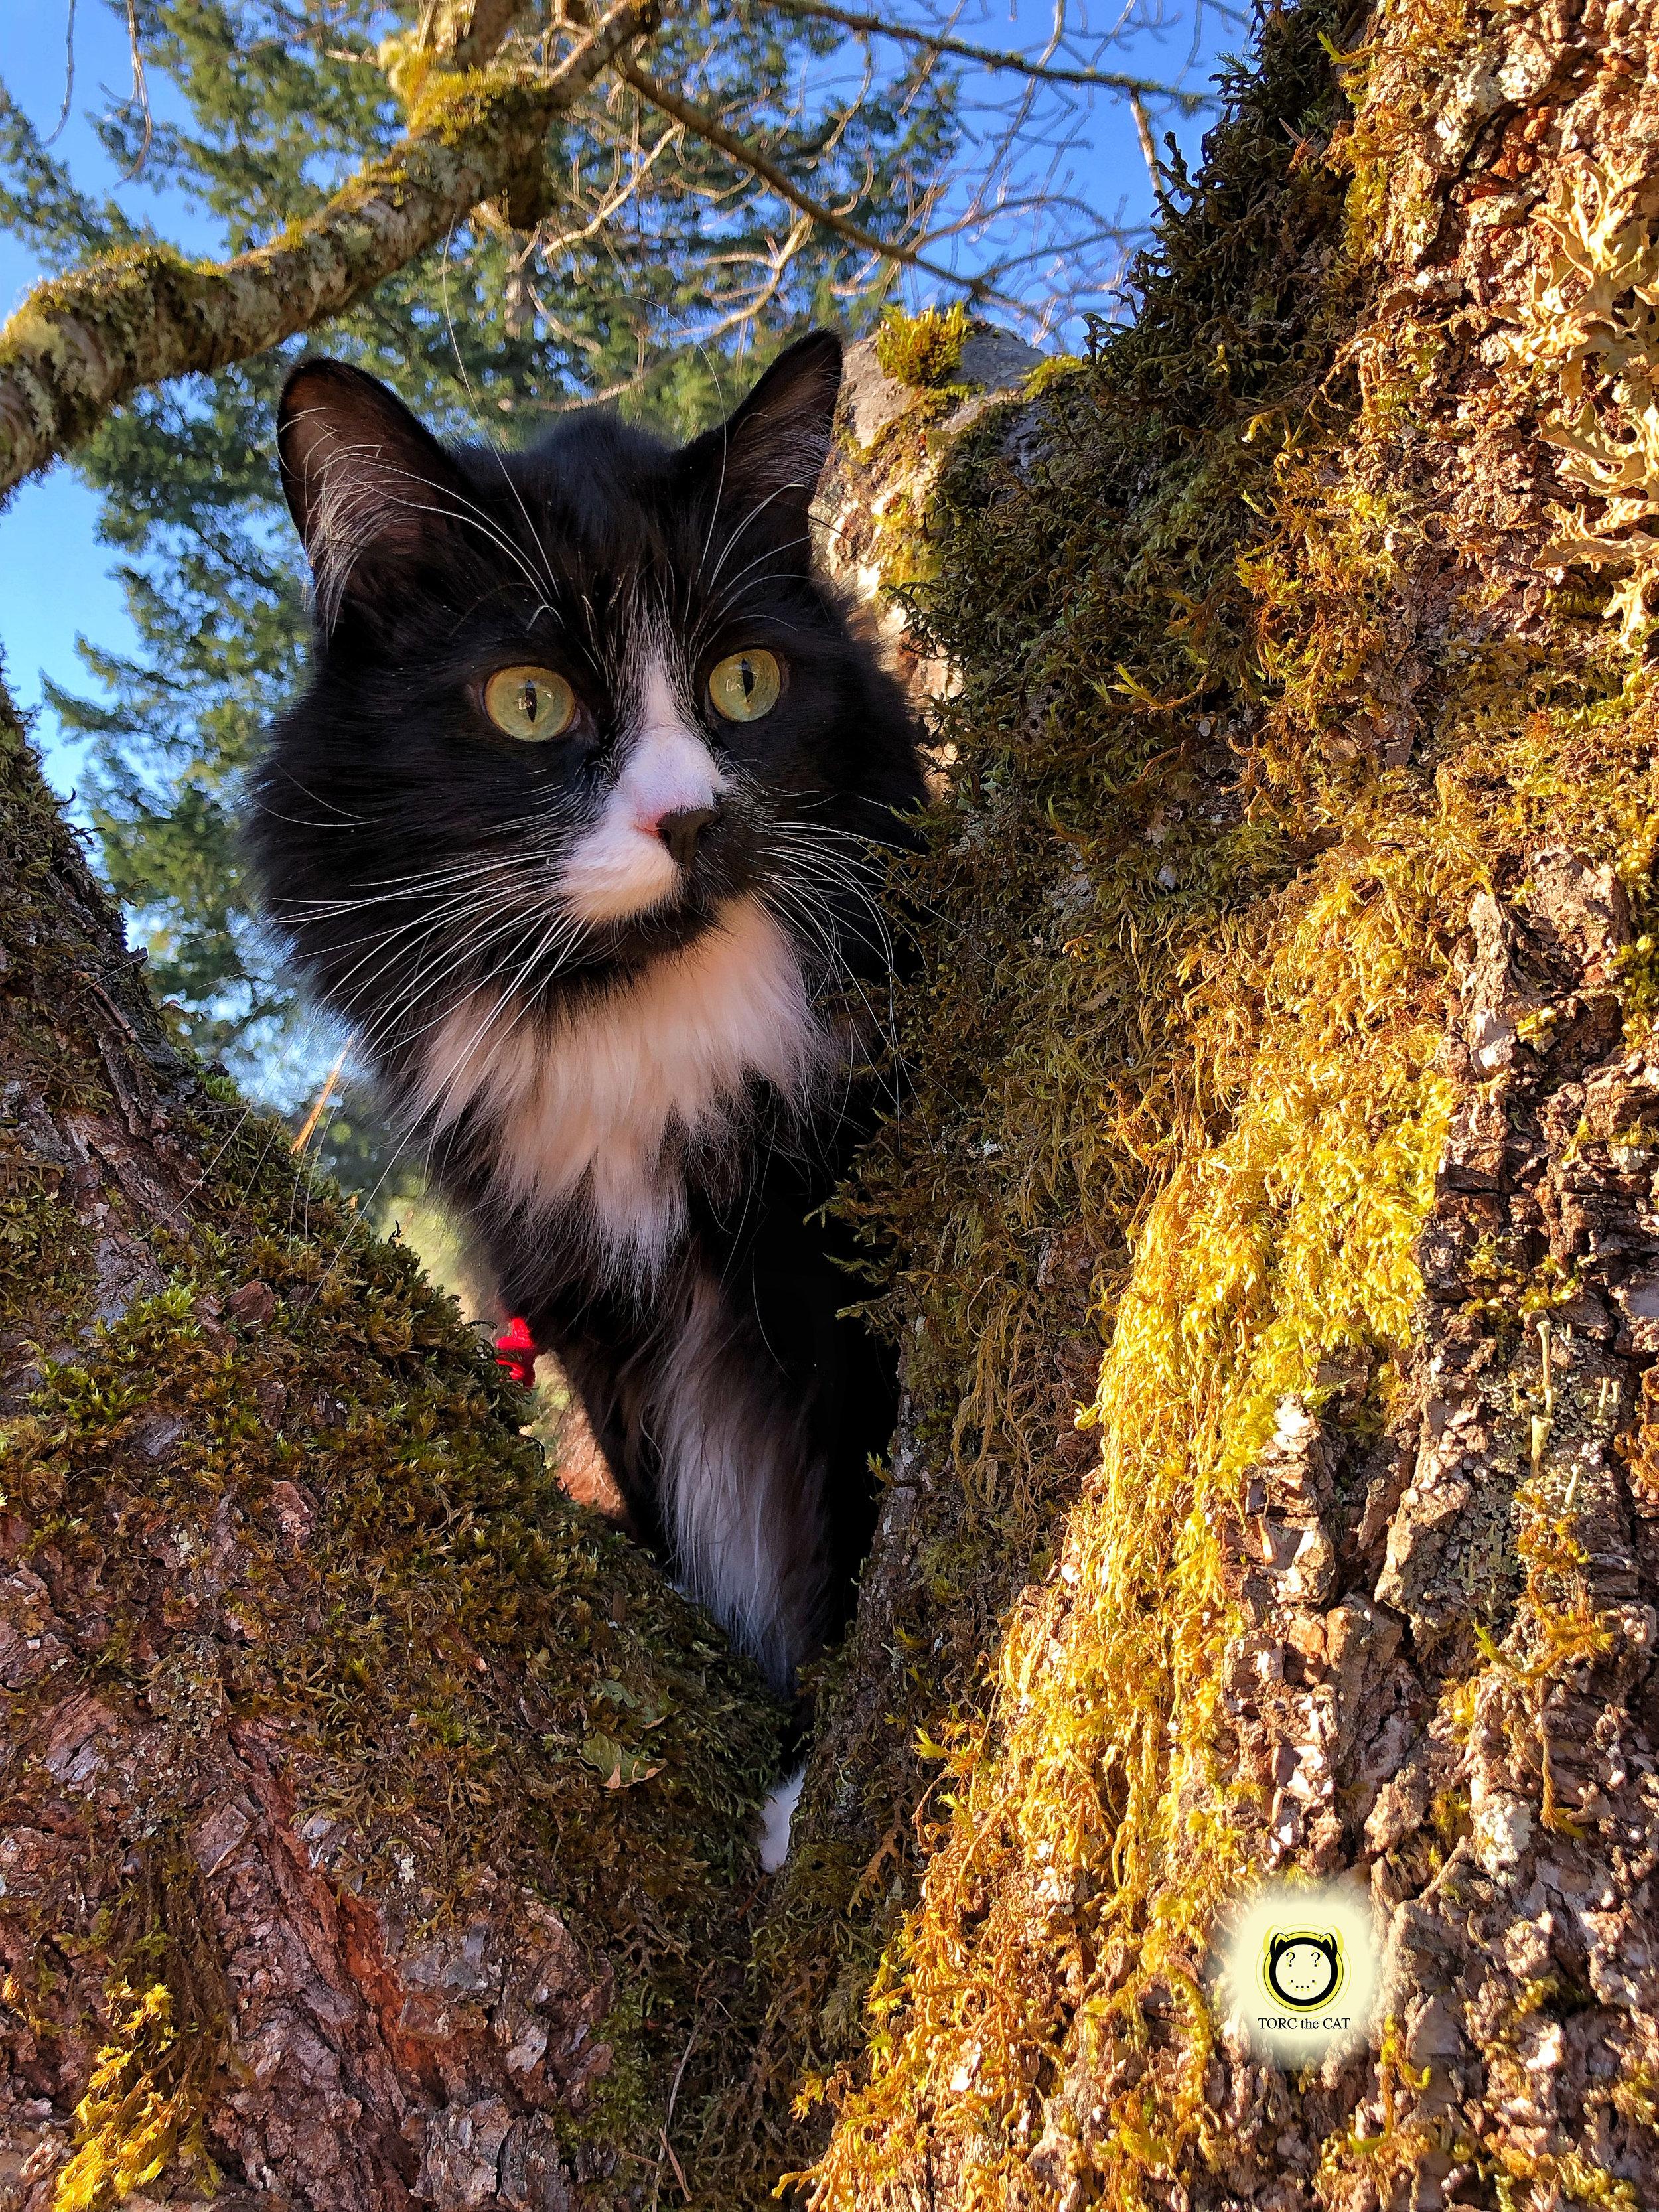 TORC the CAT adventure.jpg